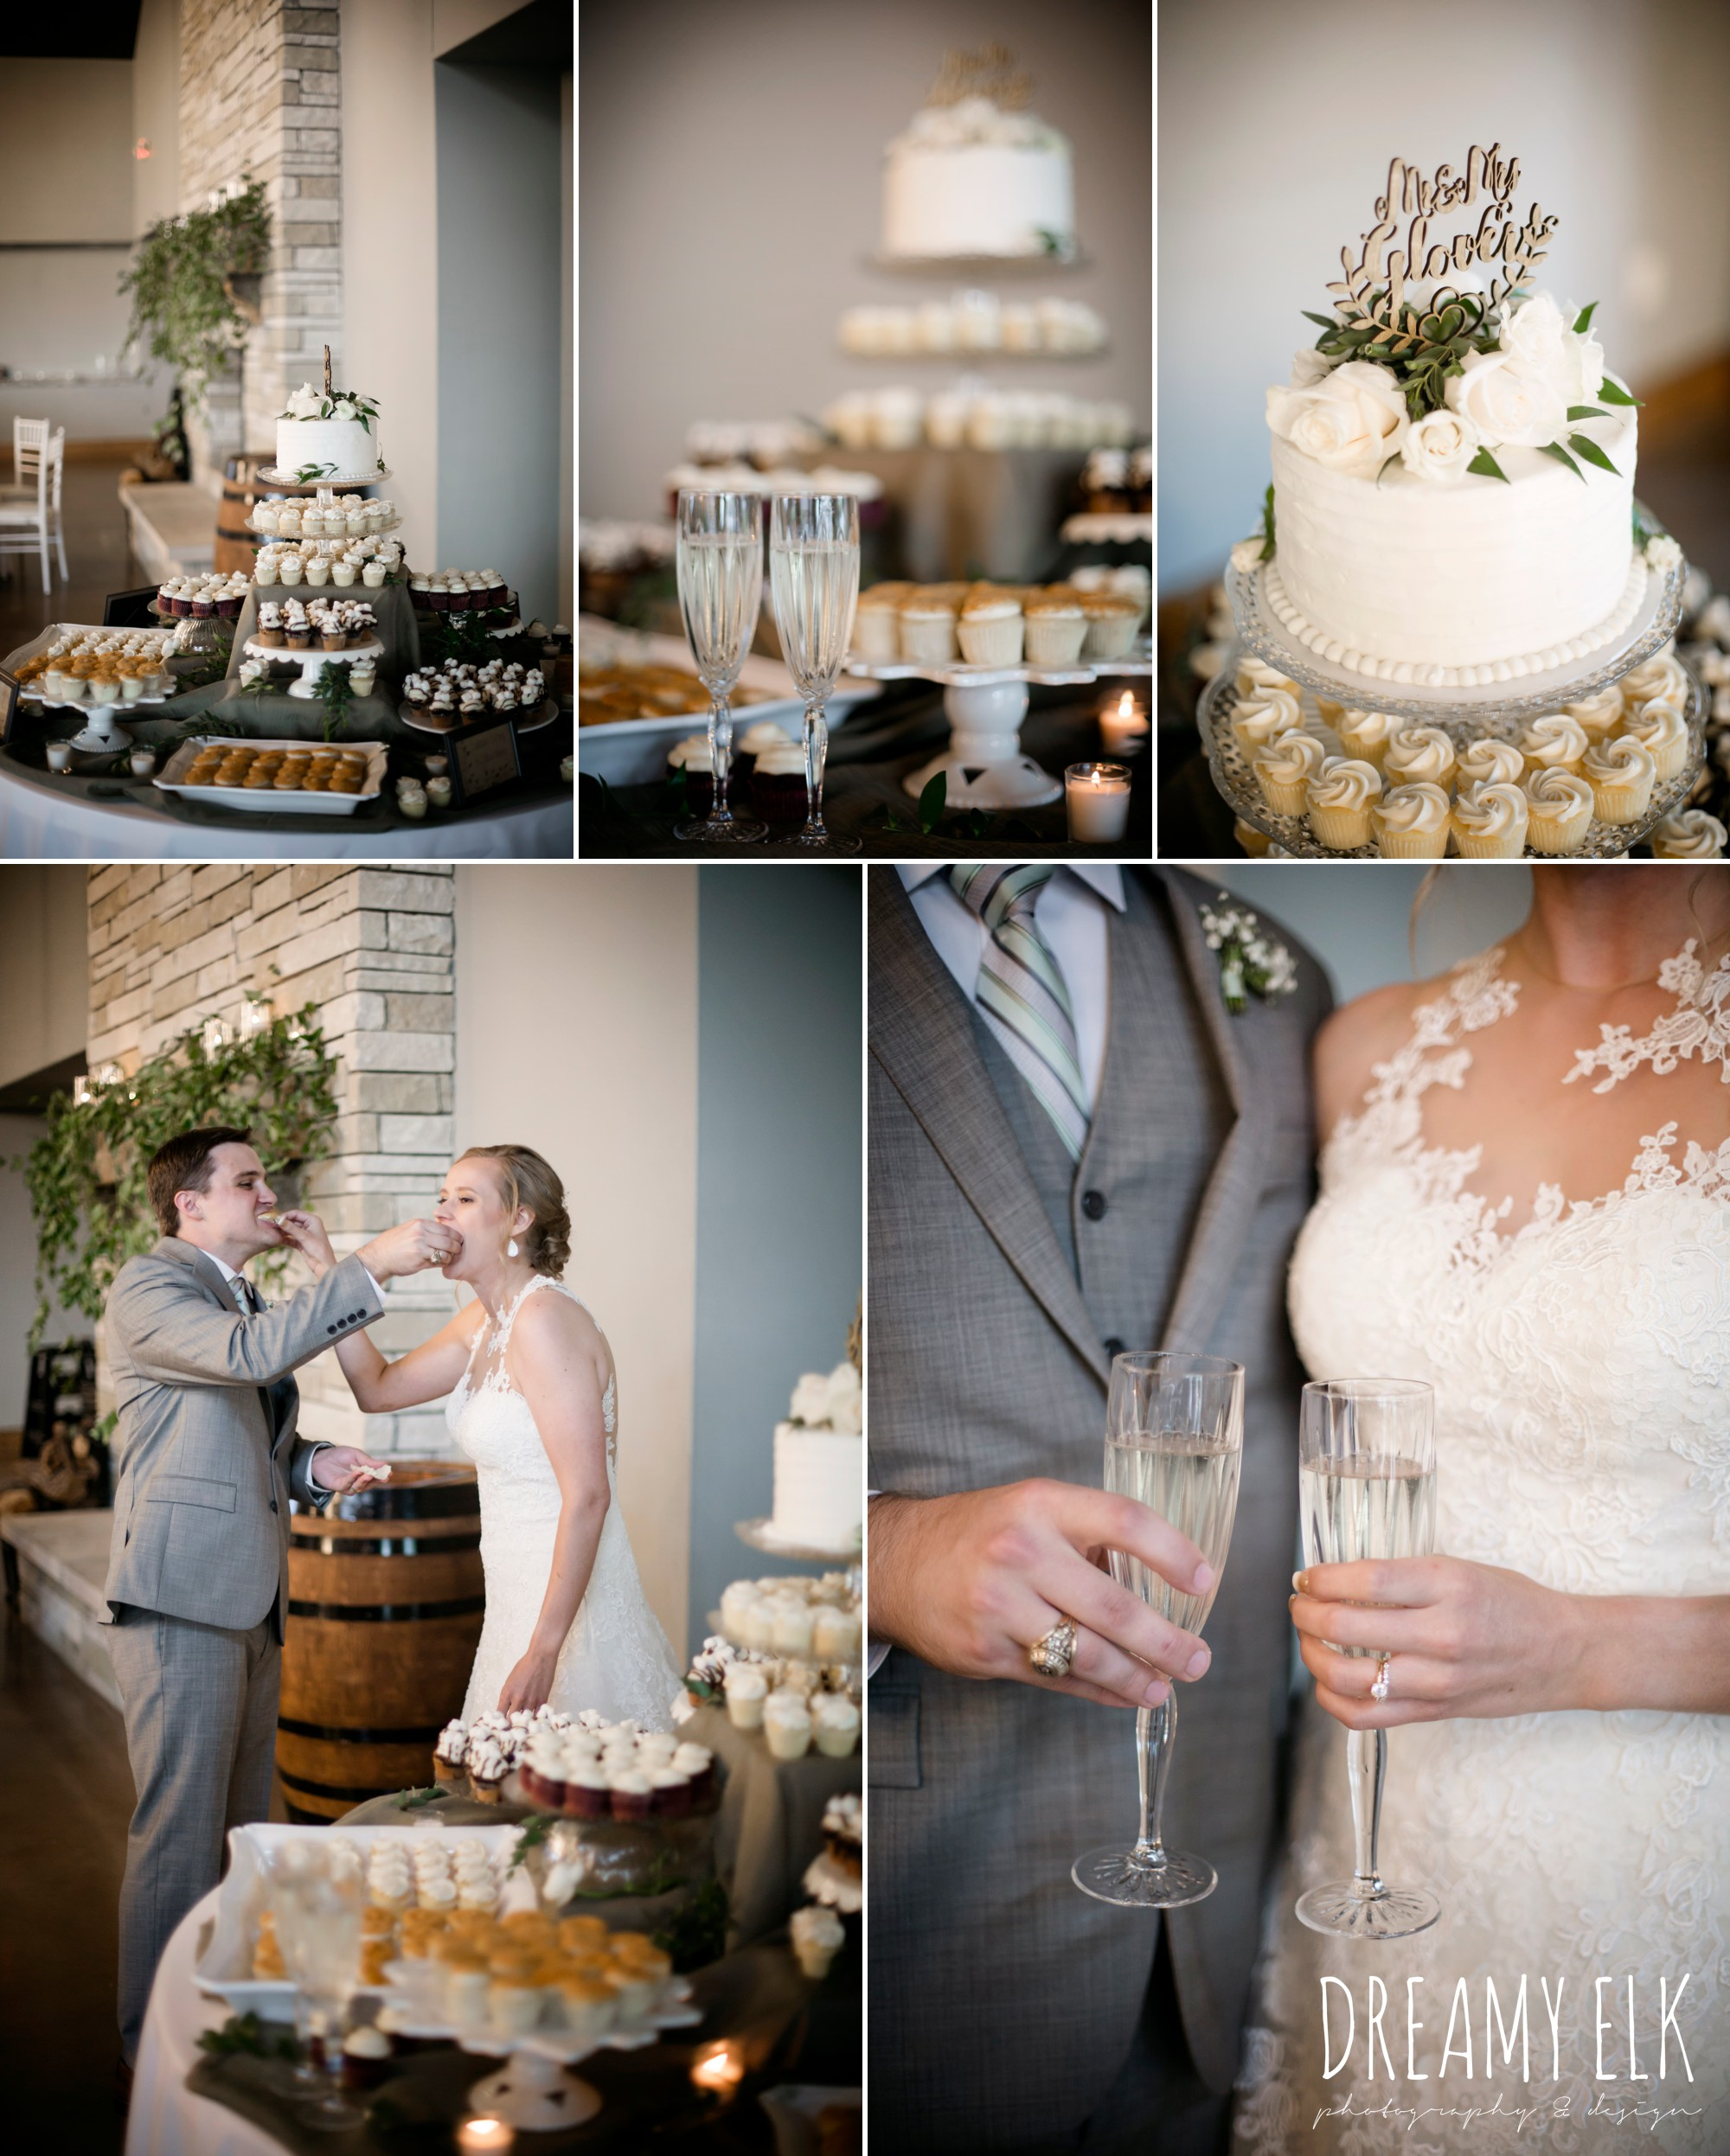 indoor wedding reception, cake table, cupcakes, sweet treet bakery, summer july wedding photo, canyonwood ridge, dripping springs, texas {dreamy elk photography and design}